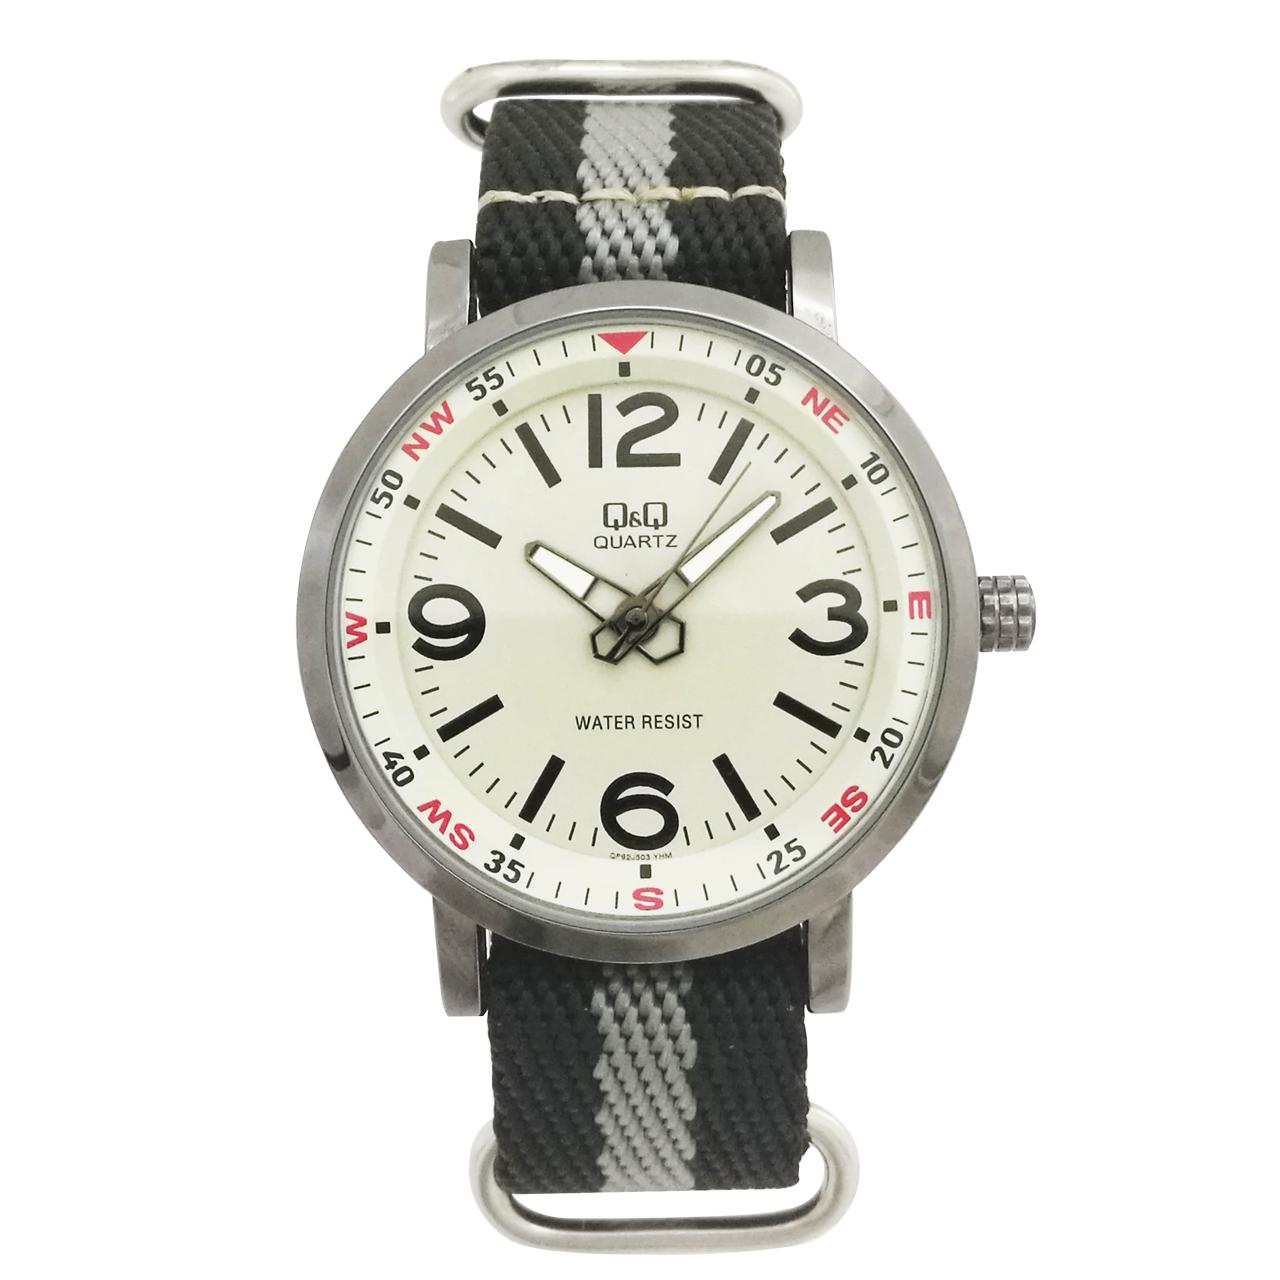 ساعت مچی عقربه ای مردانه کیو اند کیو مدل QP92J503Y